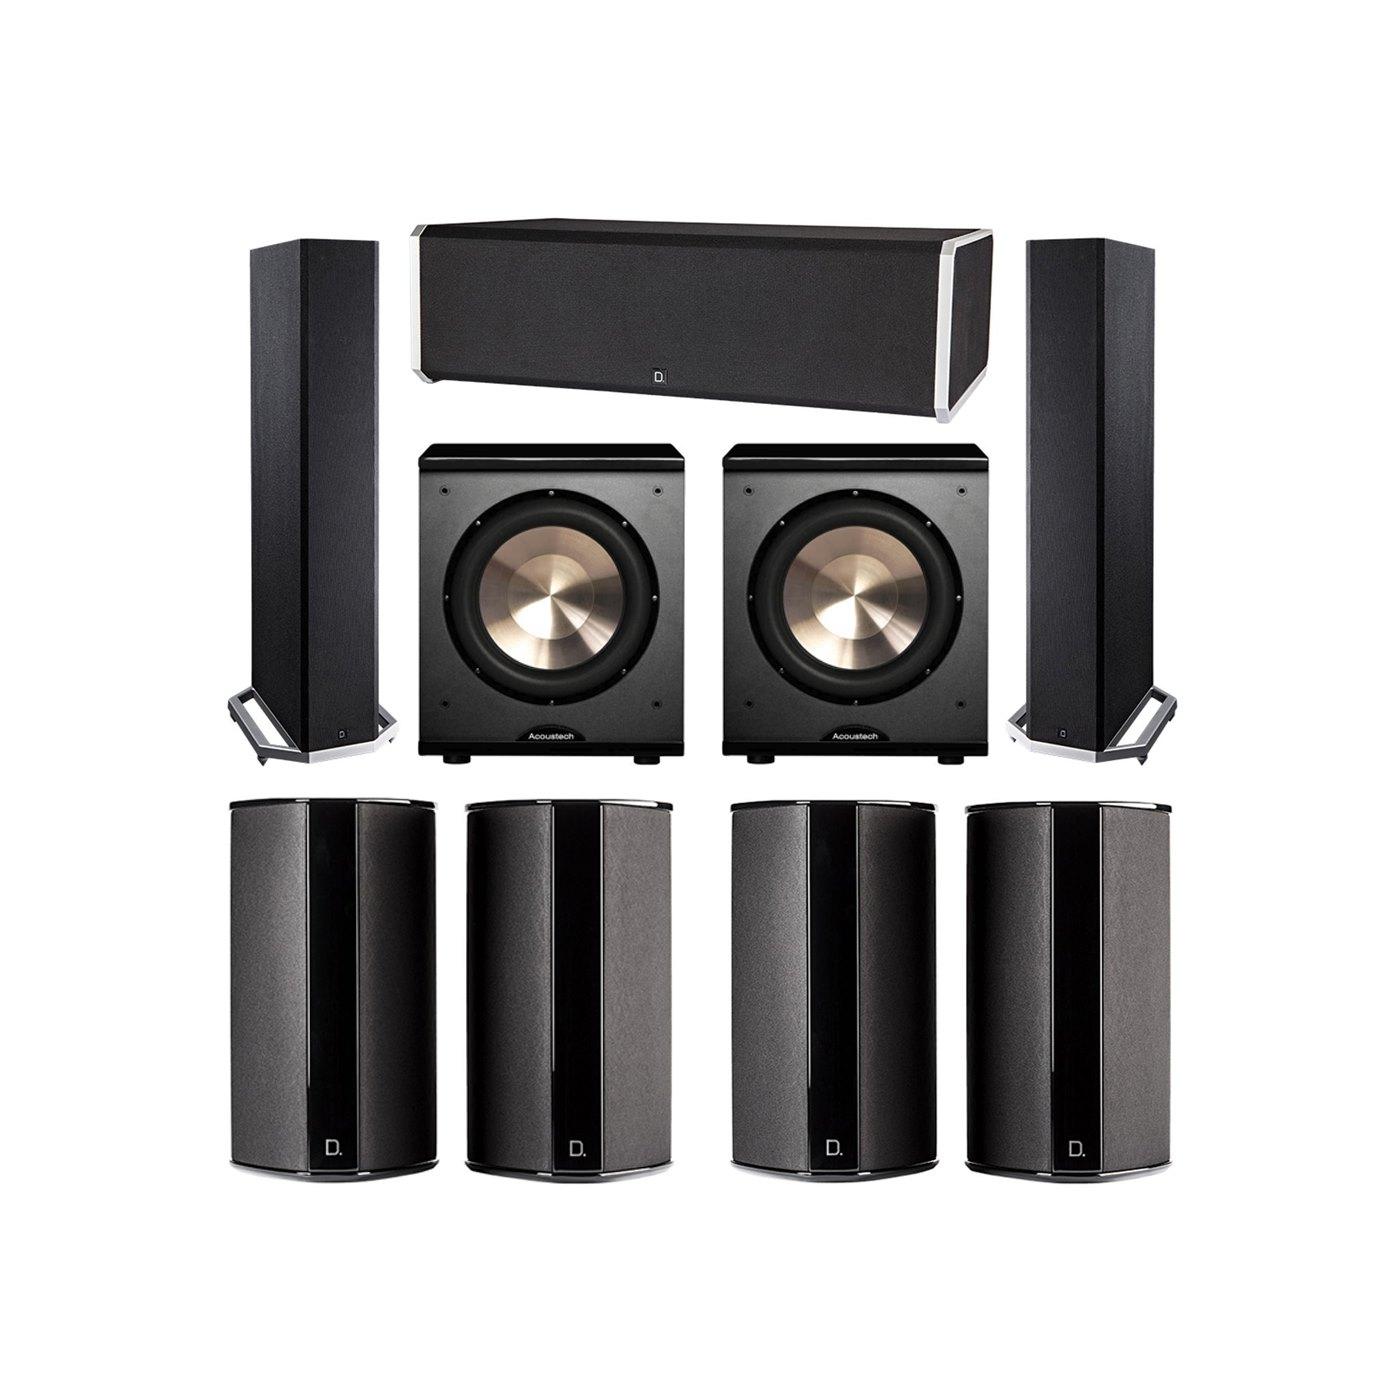 Definitive Technology 7.2 System with 2 BP9020 Tower Speakers, 1 CS9080 Center Channel Speaker, 4 SR9080 Surround Speaker, 2 BIC PL-200 Subwoofer